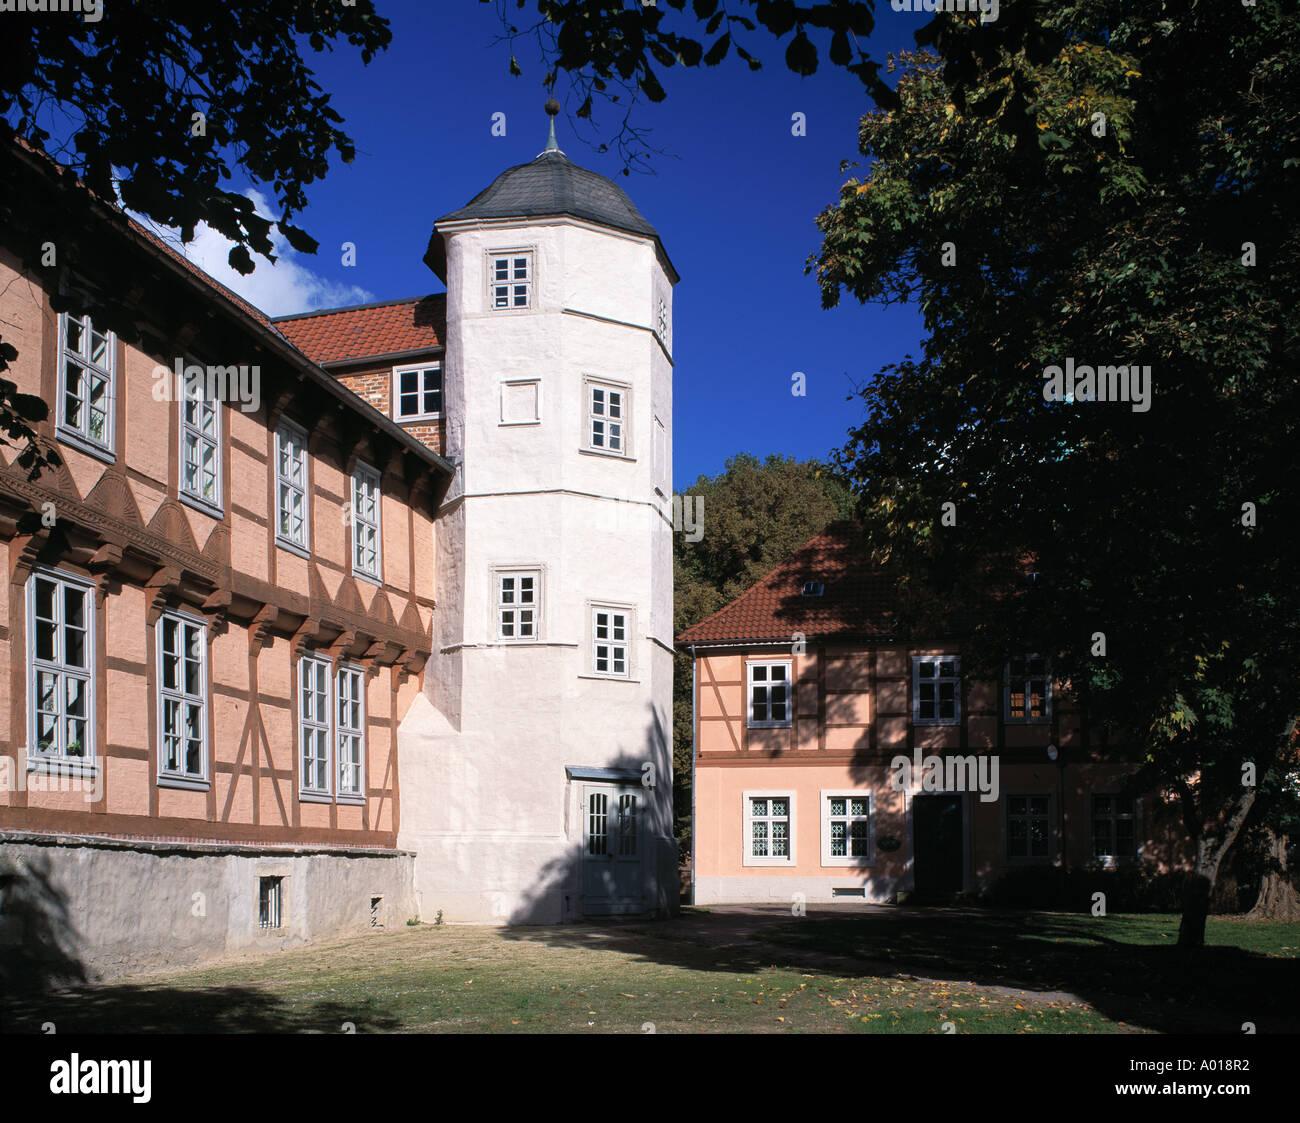 schloss heinrich hoffmann von fallersleben museum stockfoto lizenzfreies bild 5626737 alamy. Black Bedroom Furniture Sets. Home Design Ideas